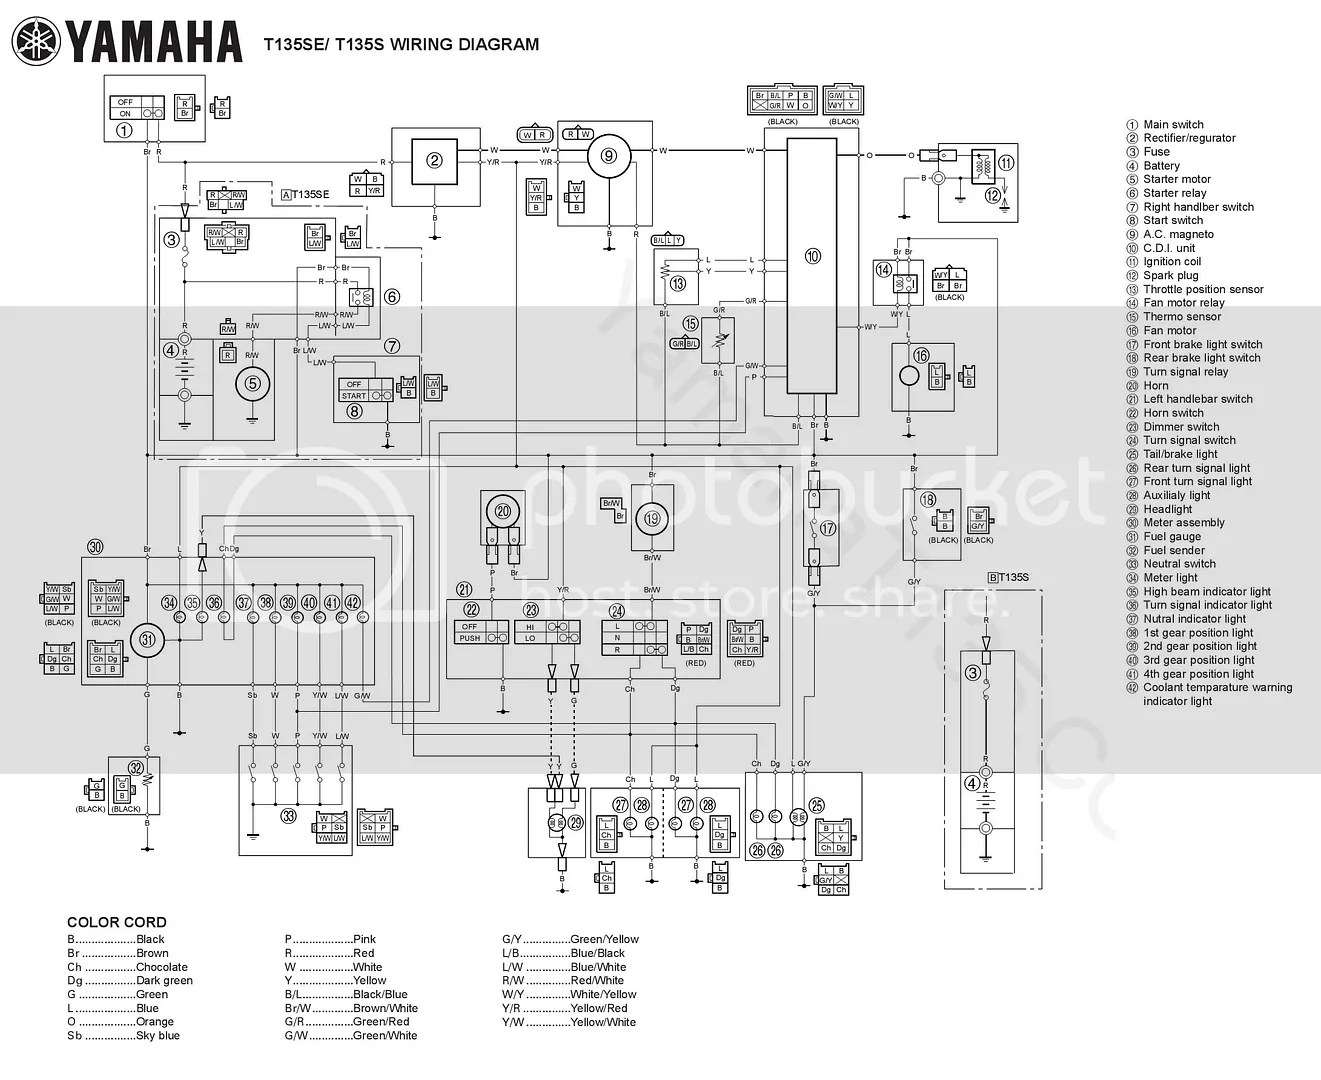 small resolution of yamaha mio headlight wiring diagram